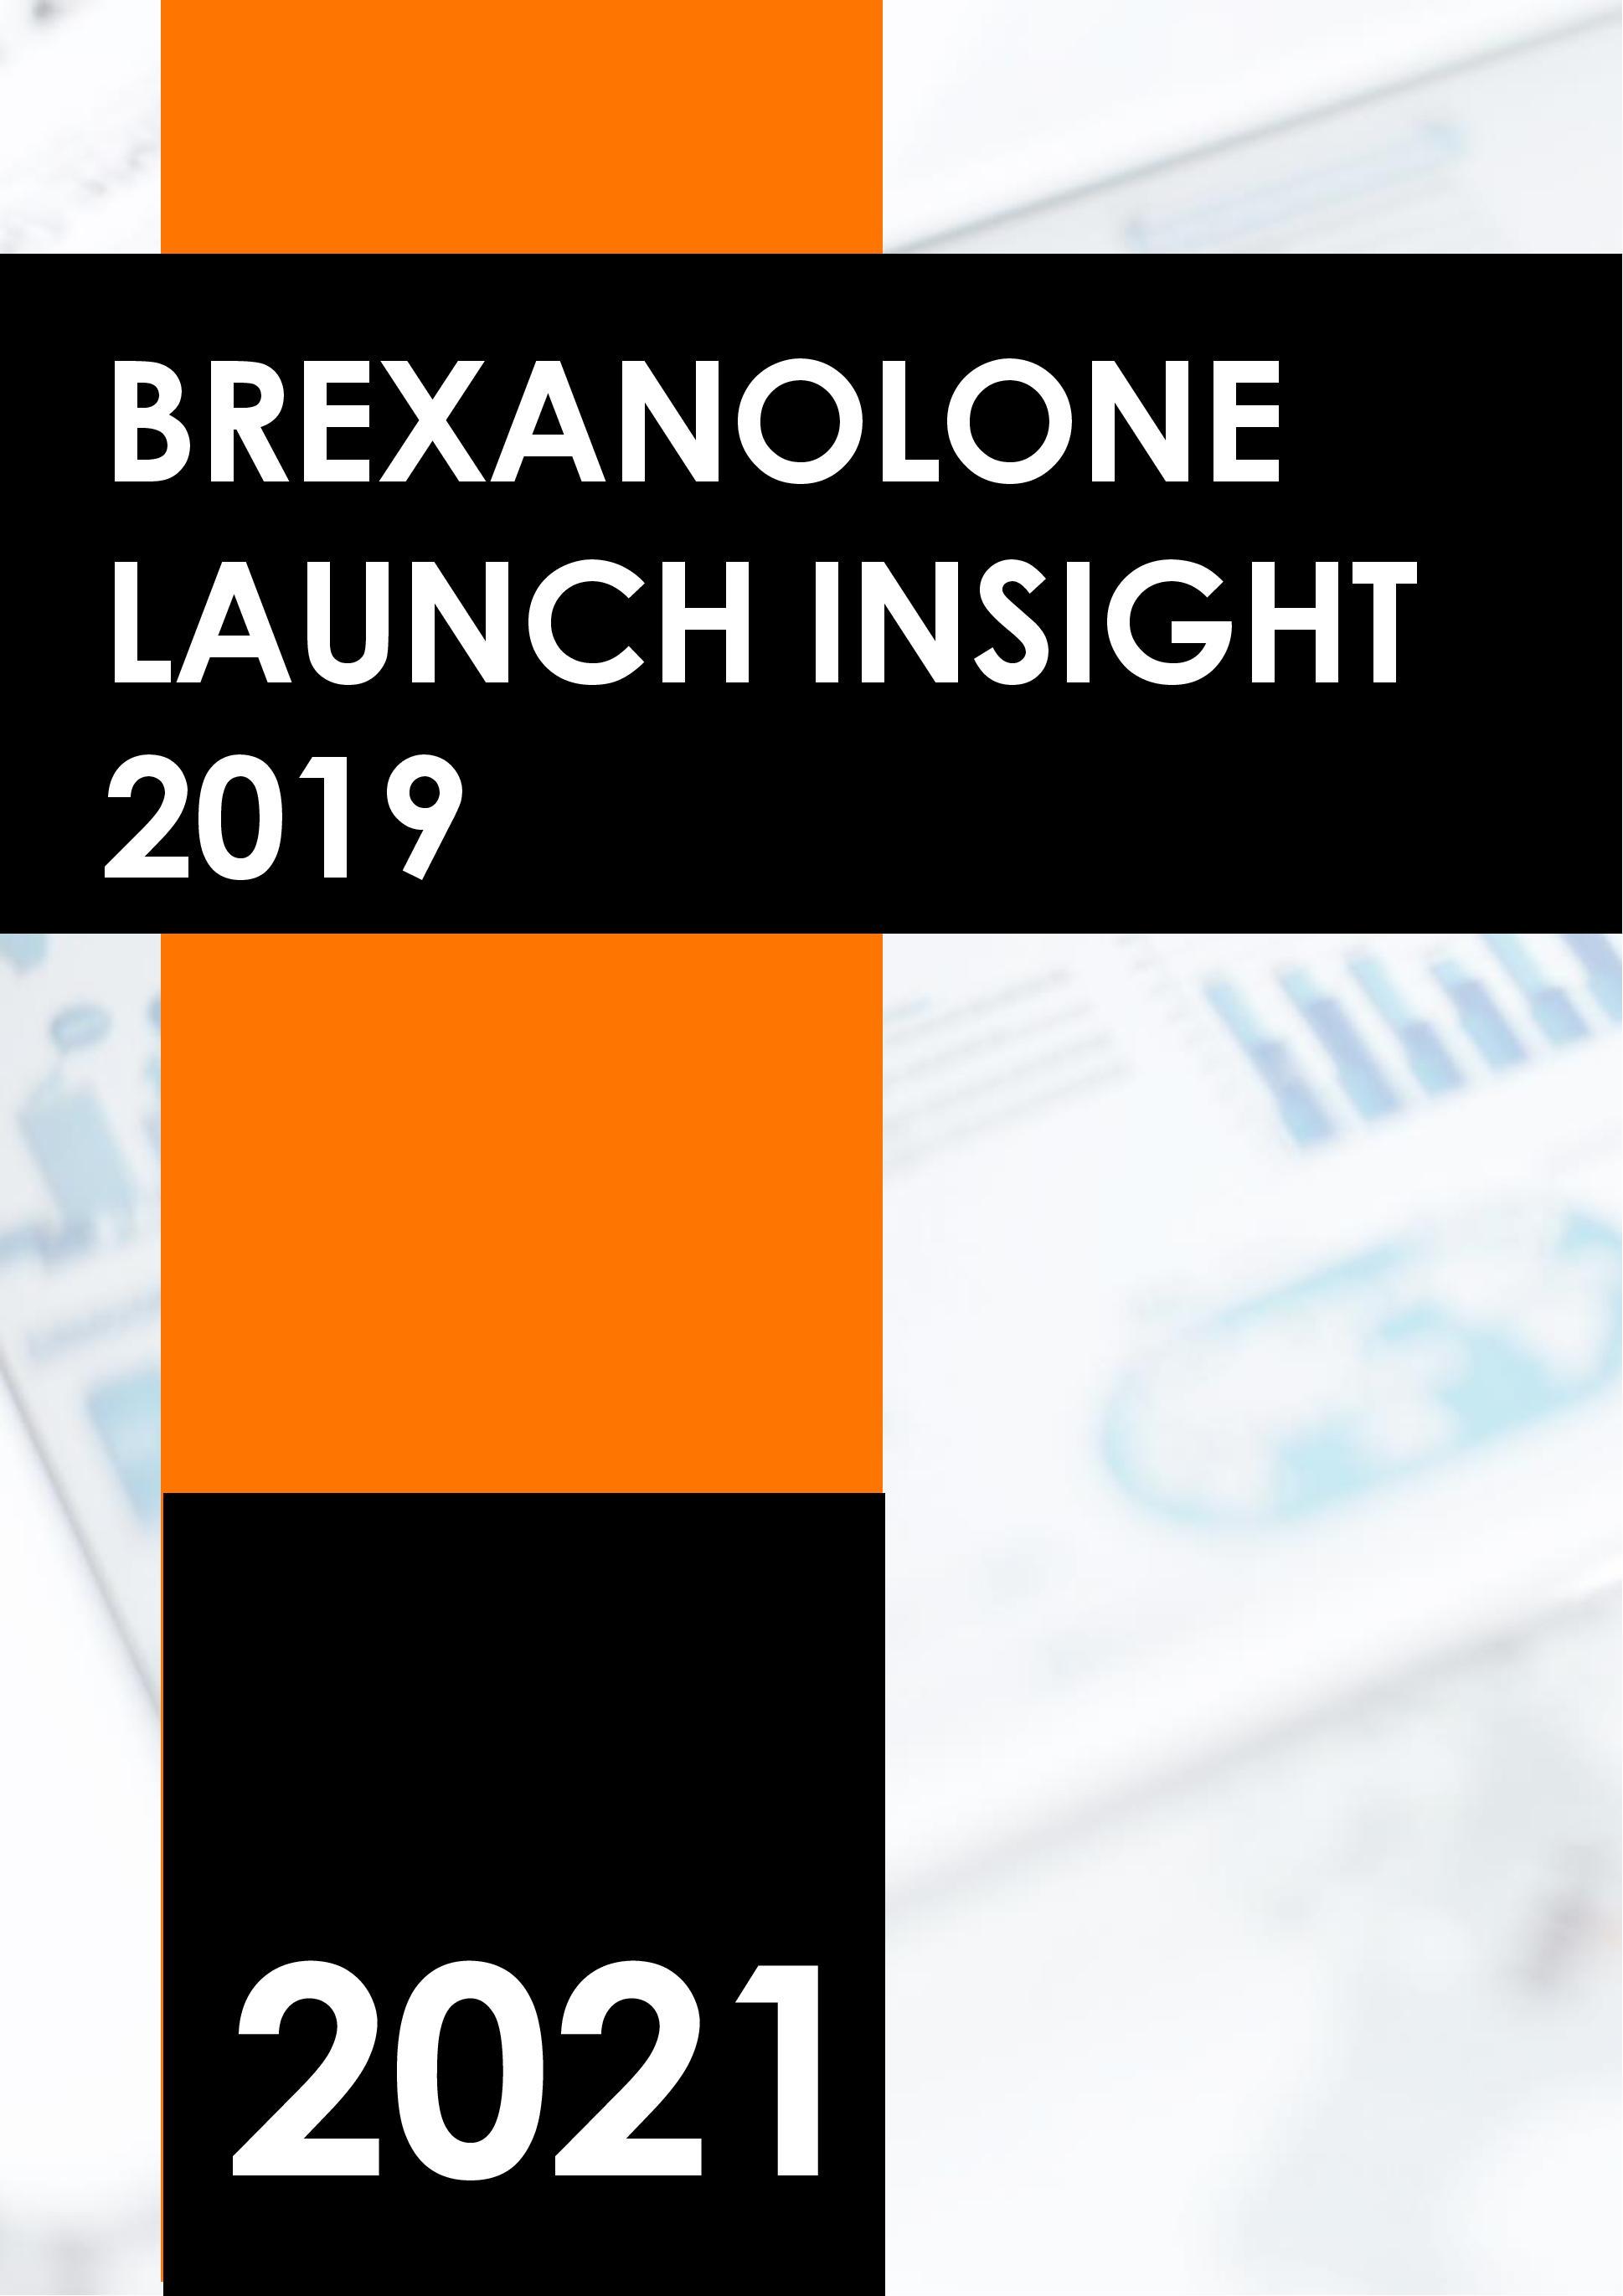 Siponimod Launch Insight 2019